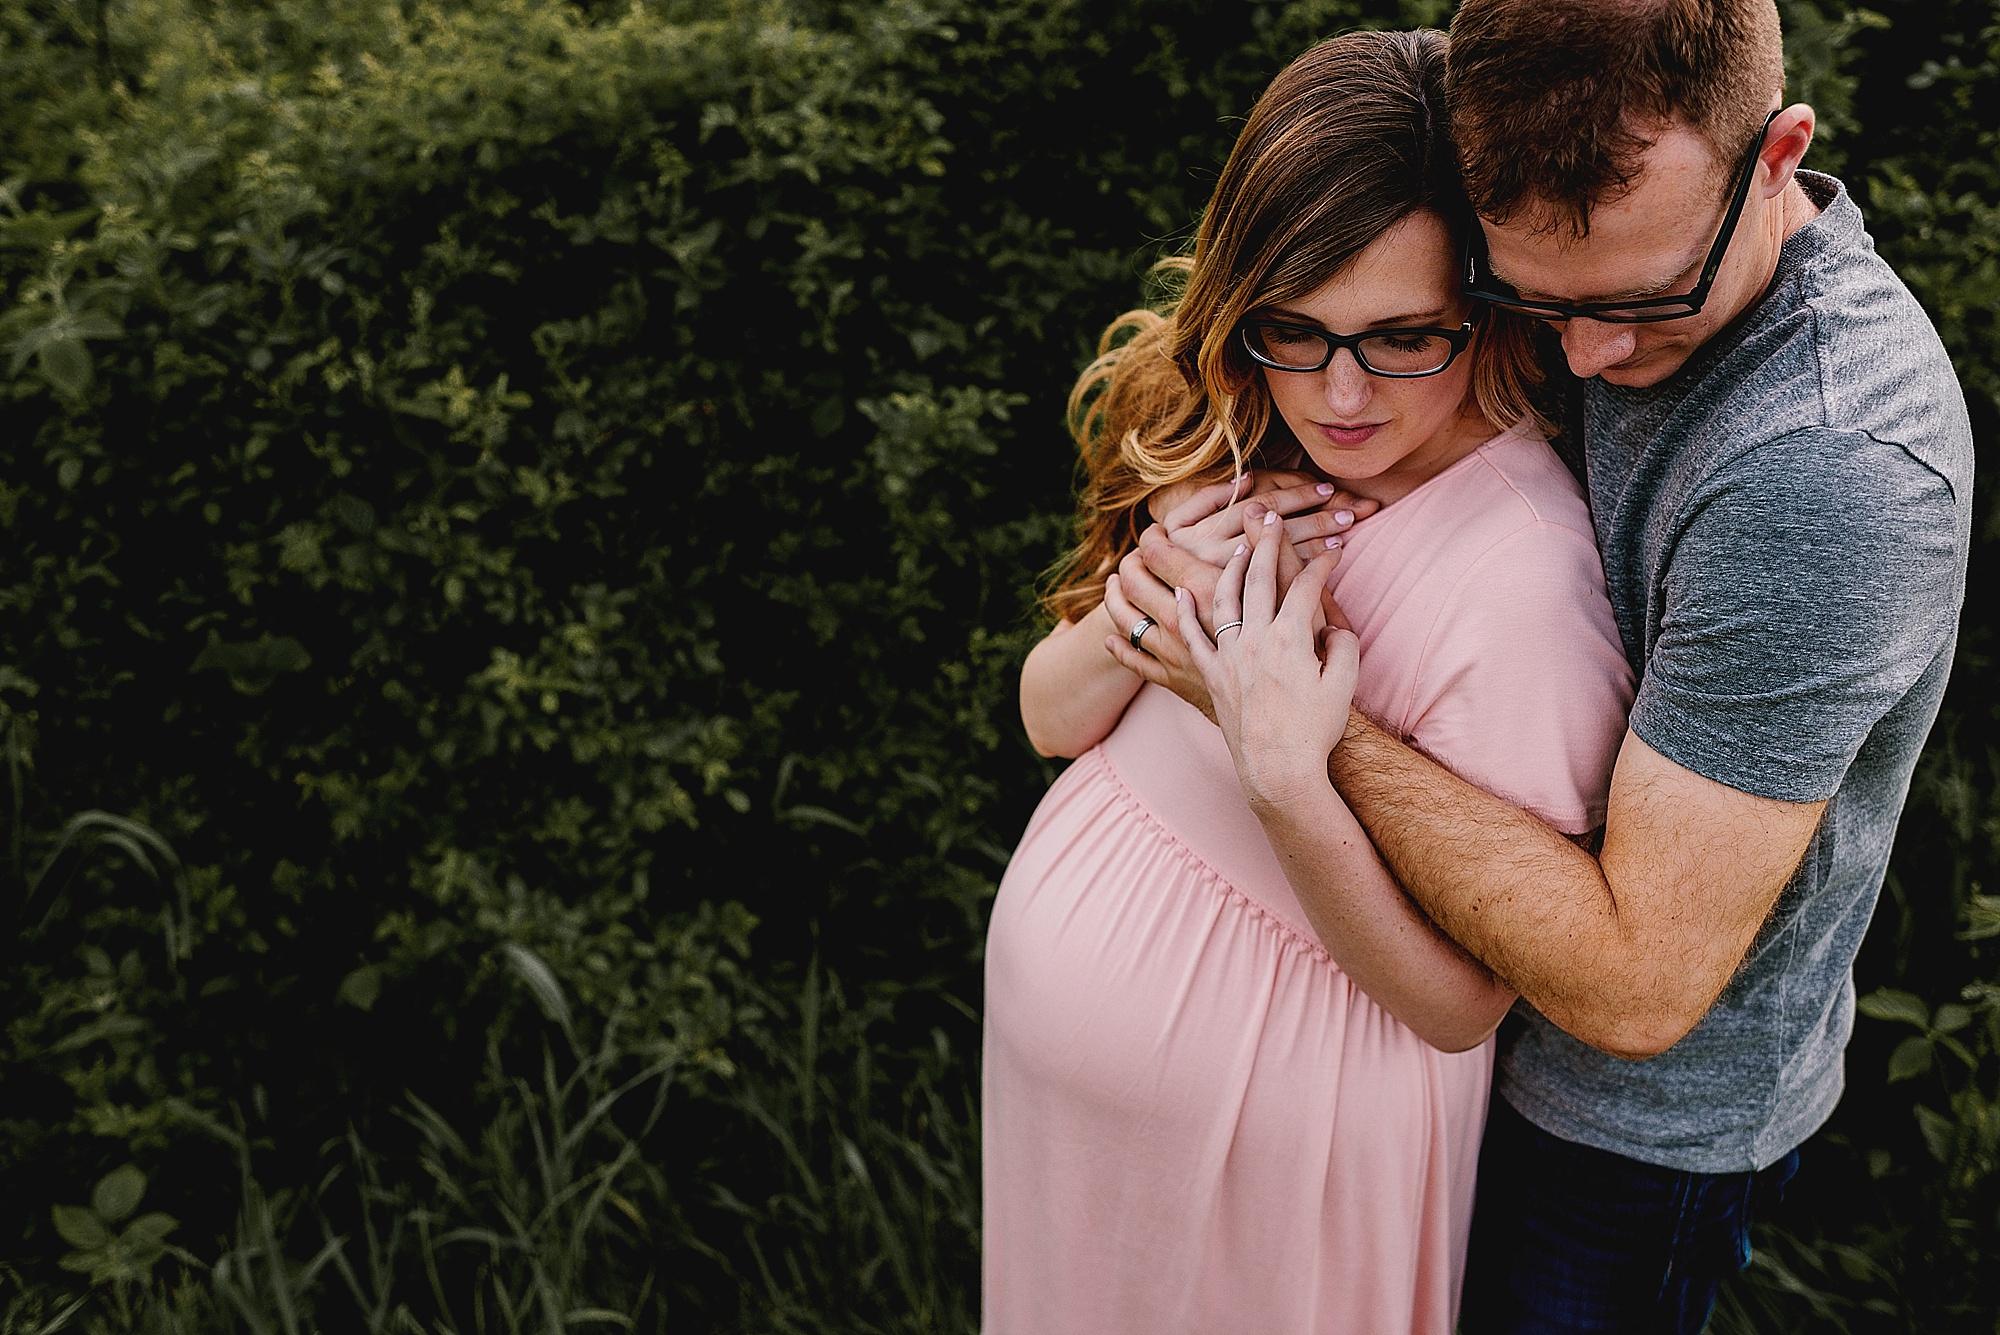 lauren-grayson-photography-akron-ohio-photographer-family-maternity-fields-session_0352.jpg